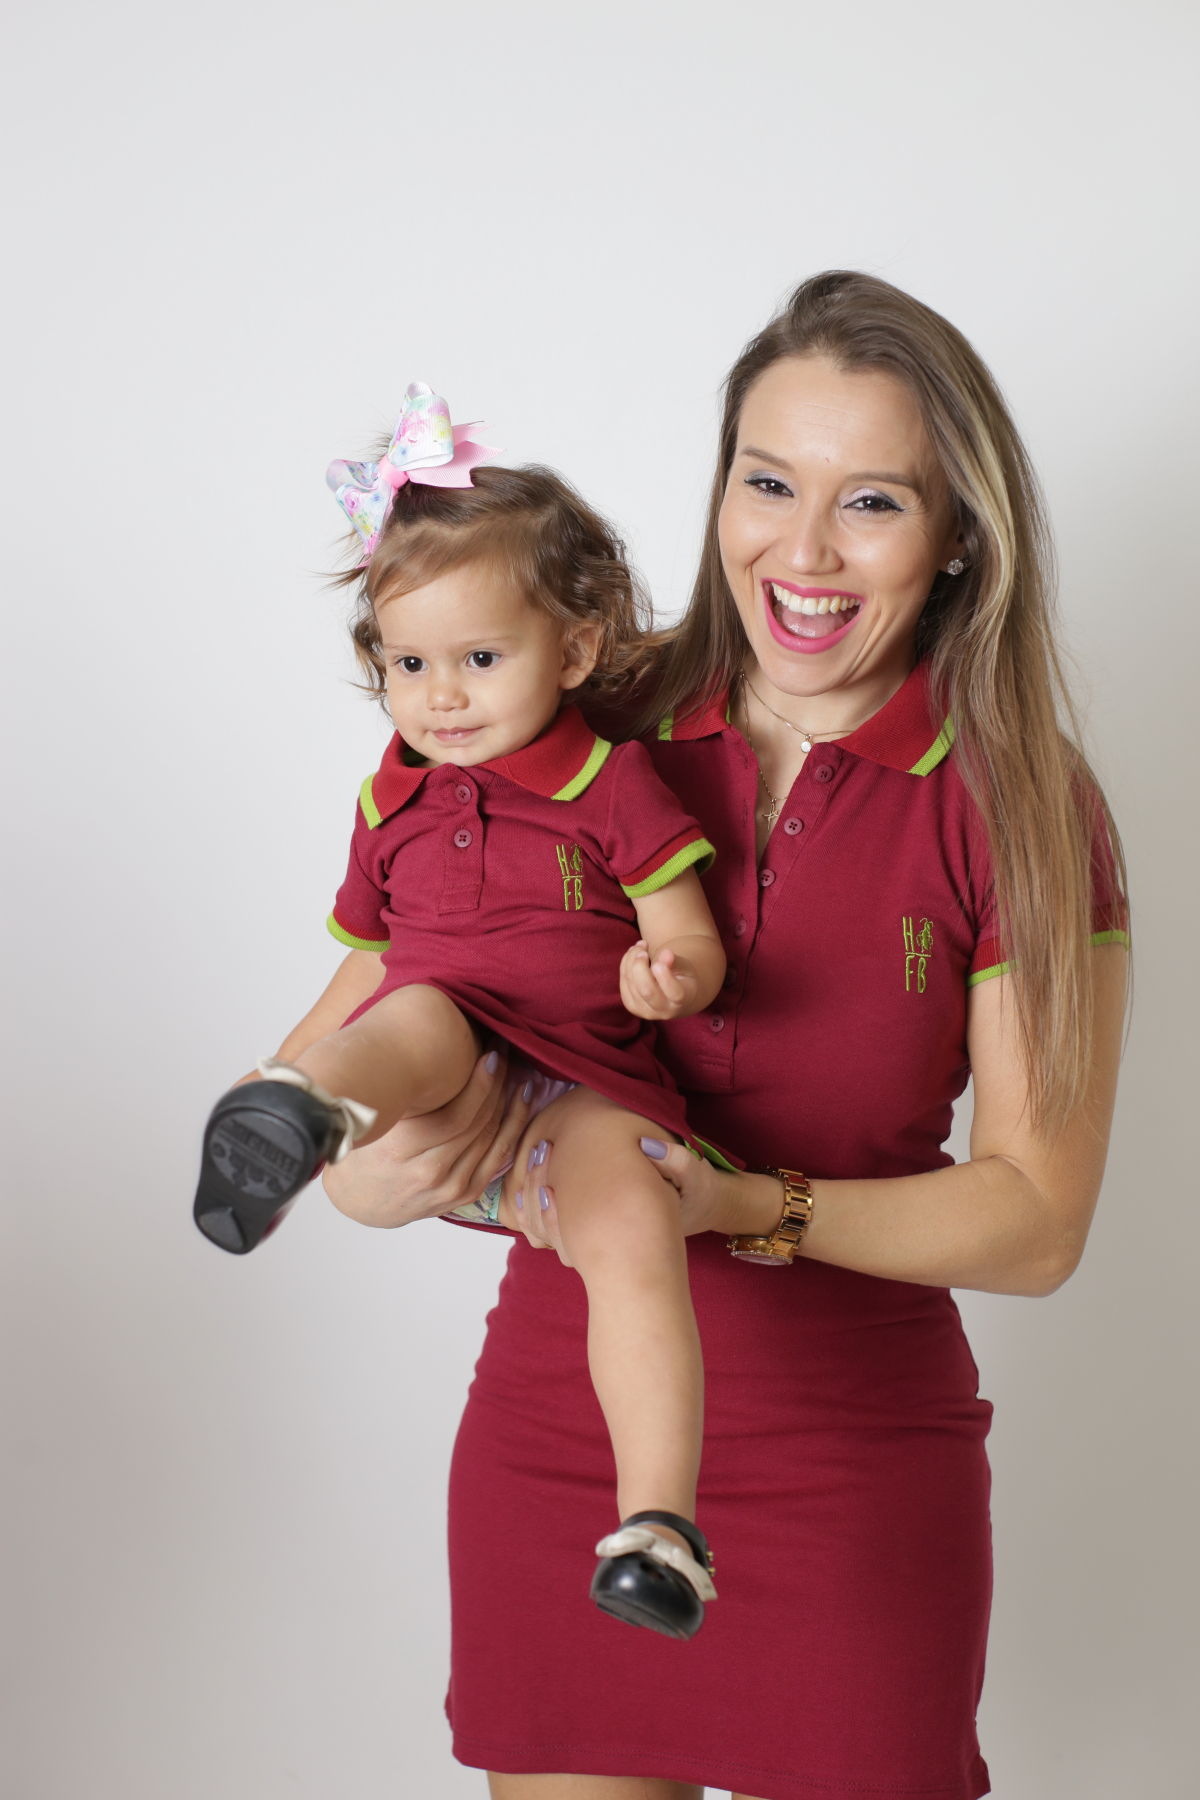 MÃE E FILHA > Kit 02 Vestidos Adulto e Infantil Bordo [Coleção Tal Mãe Tal Filha]